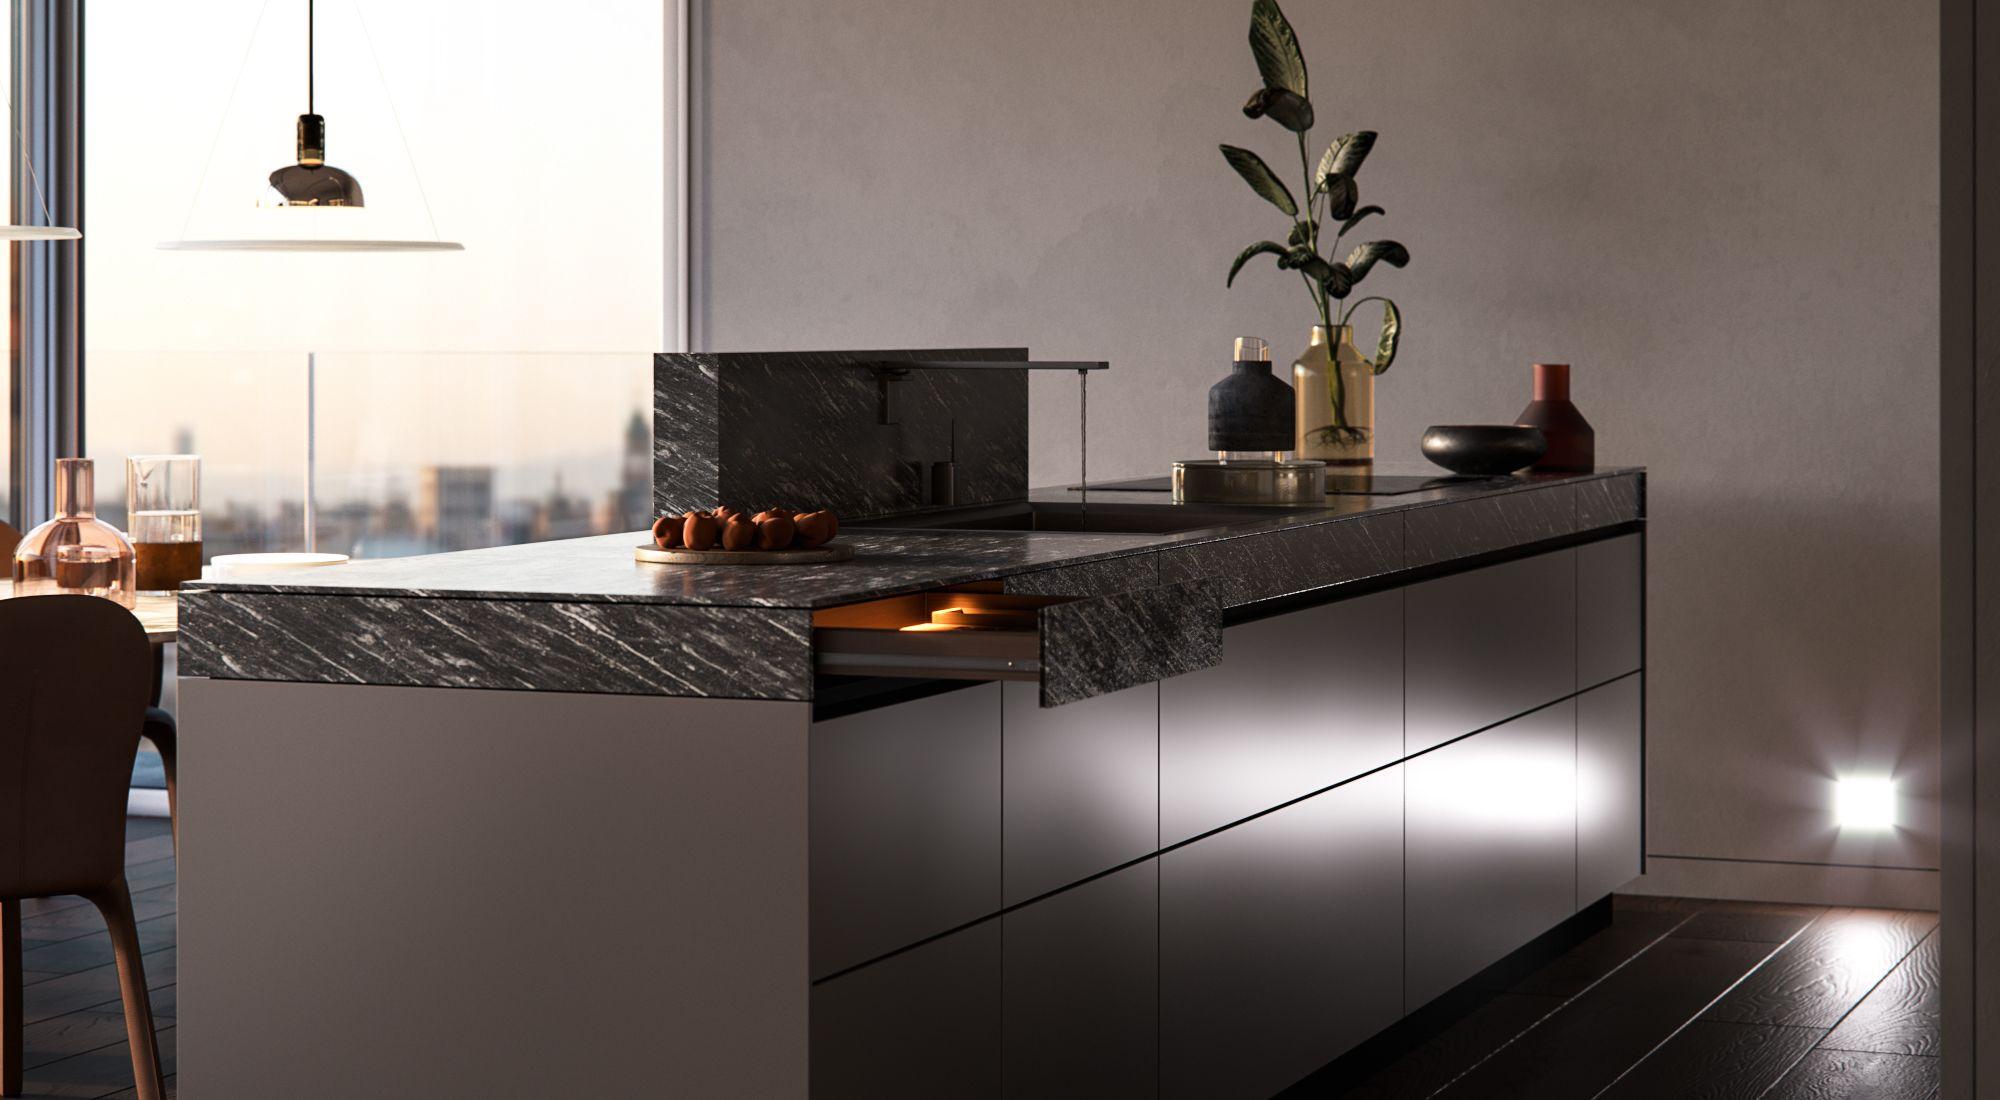 -Barcelona Apartment- On Behance